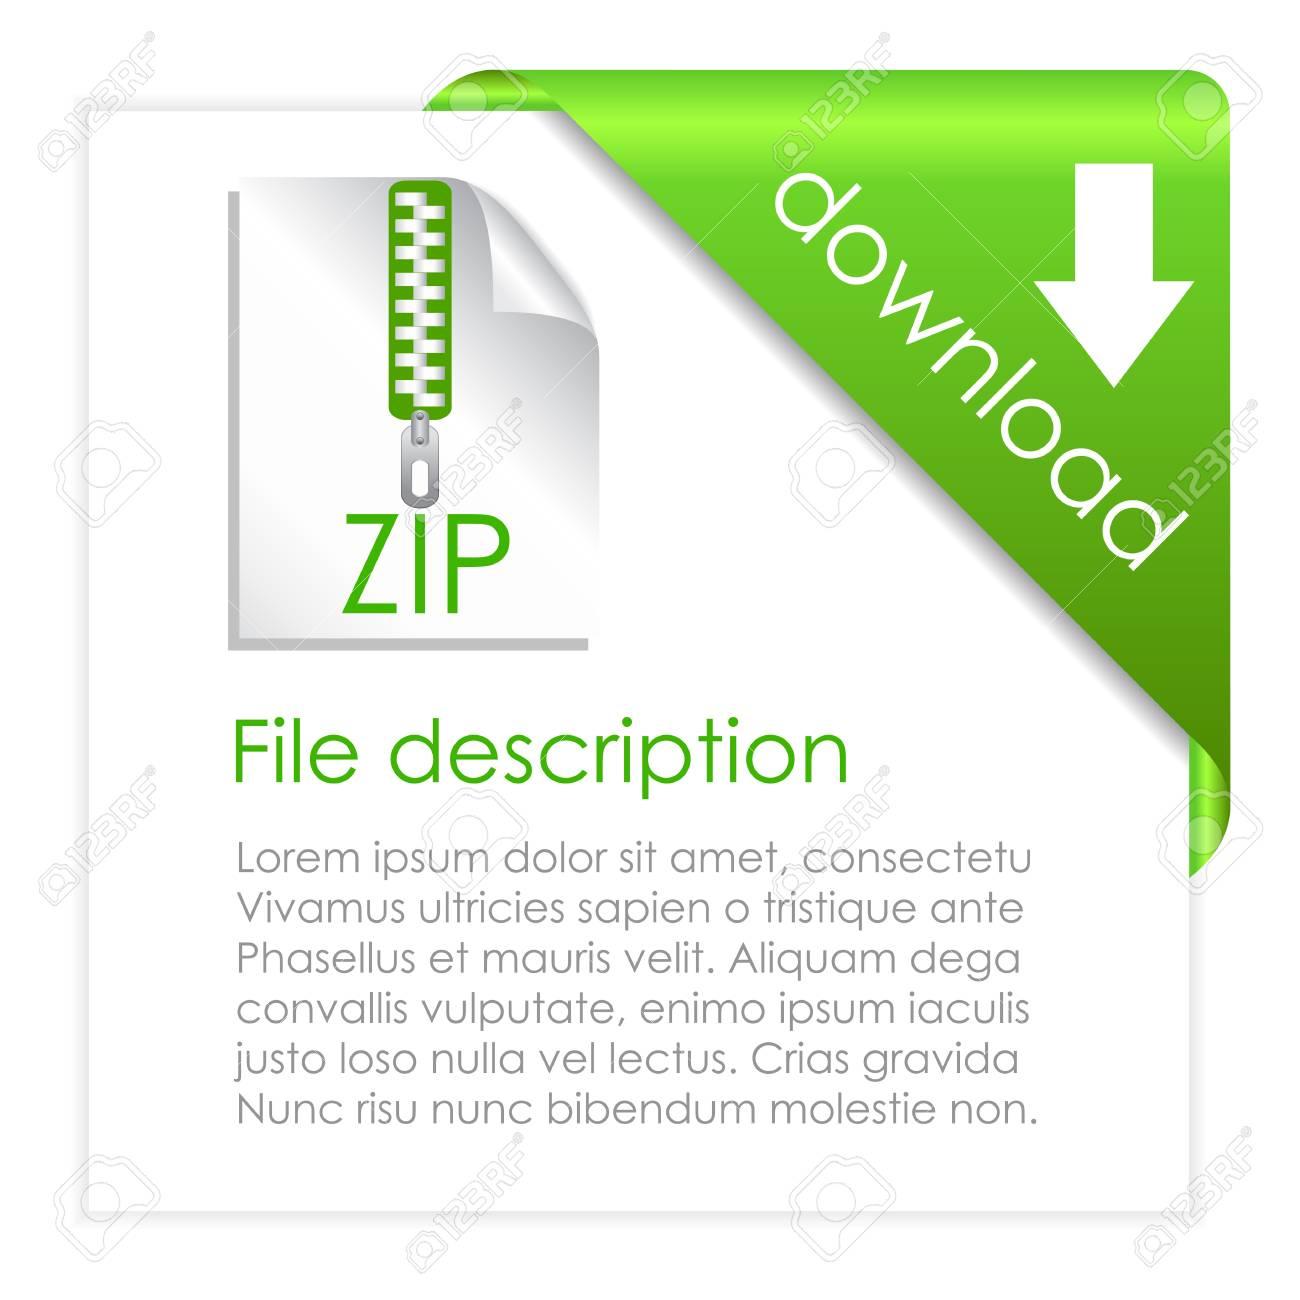 Zip archive download icon Stock Vector - 20002212